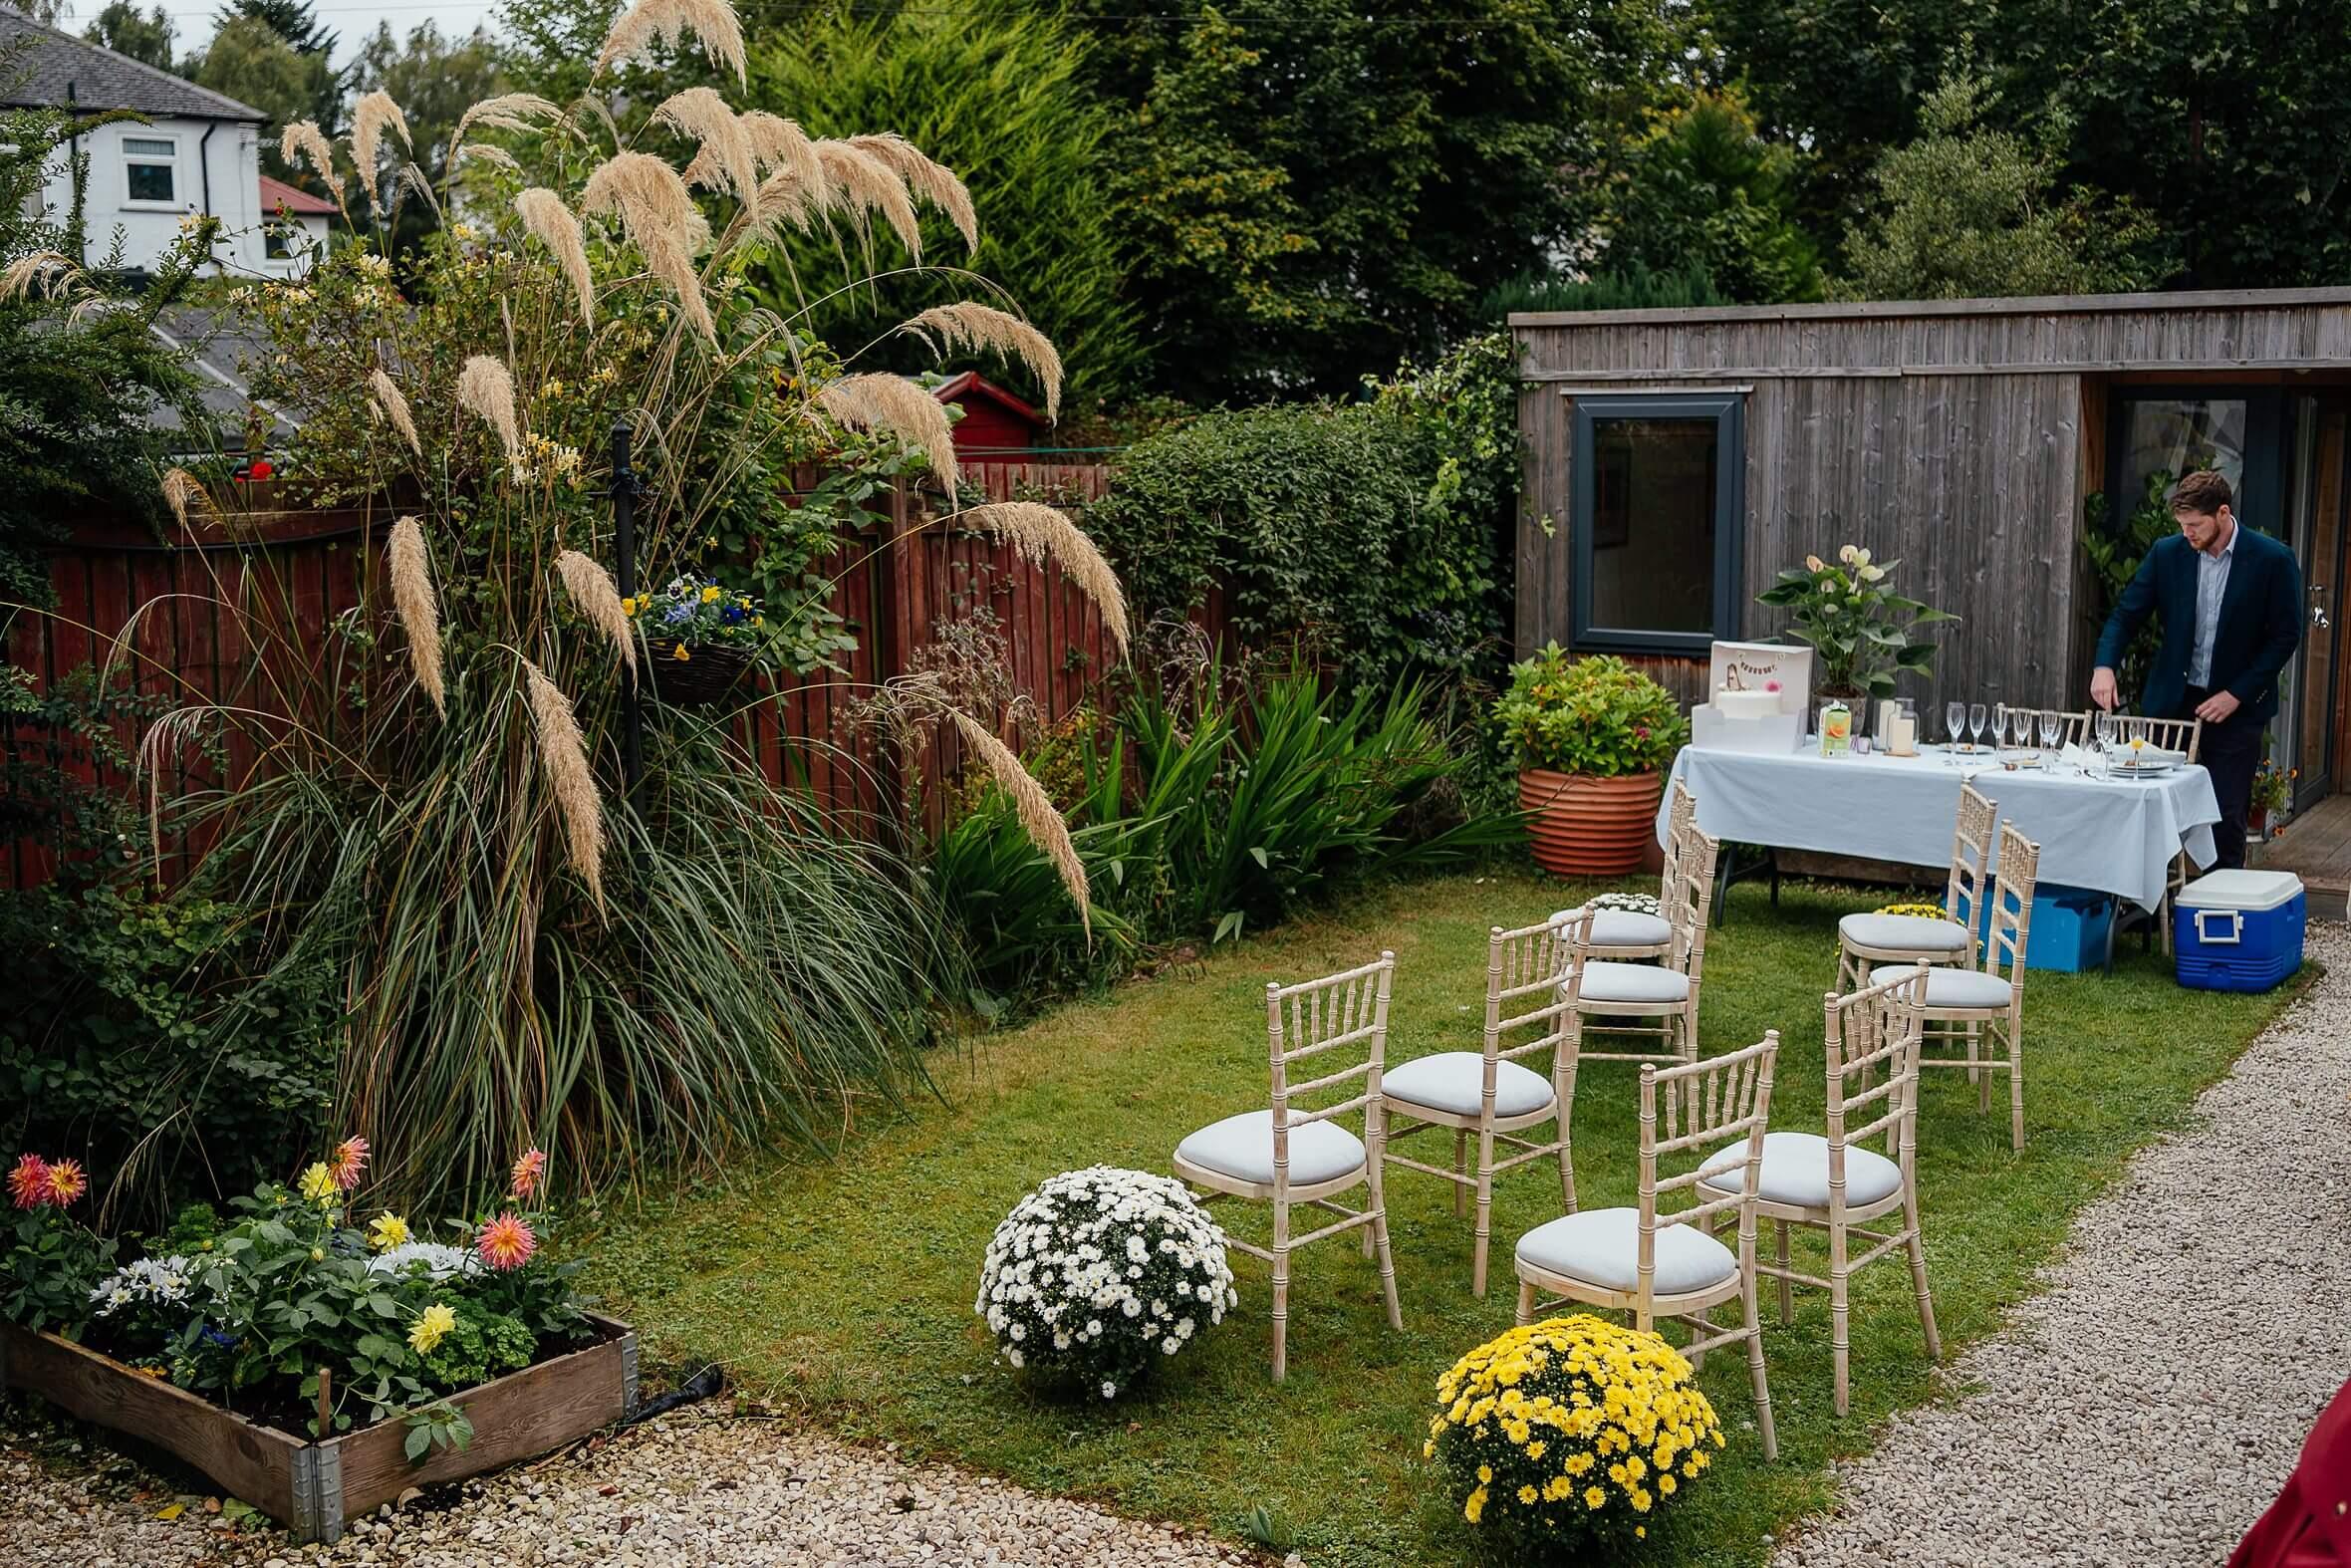 micro wedding scotland back garden wedding ceremony set up